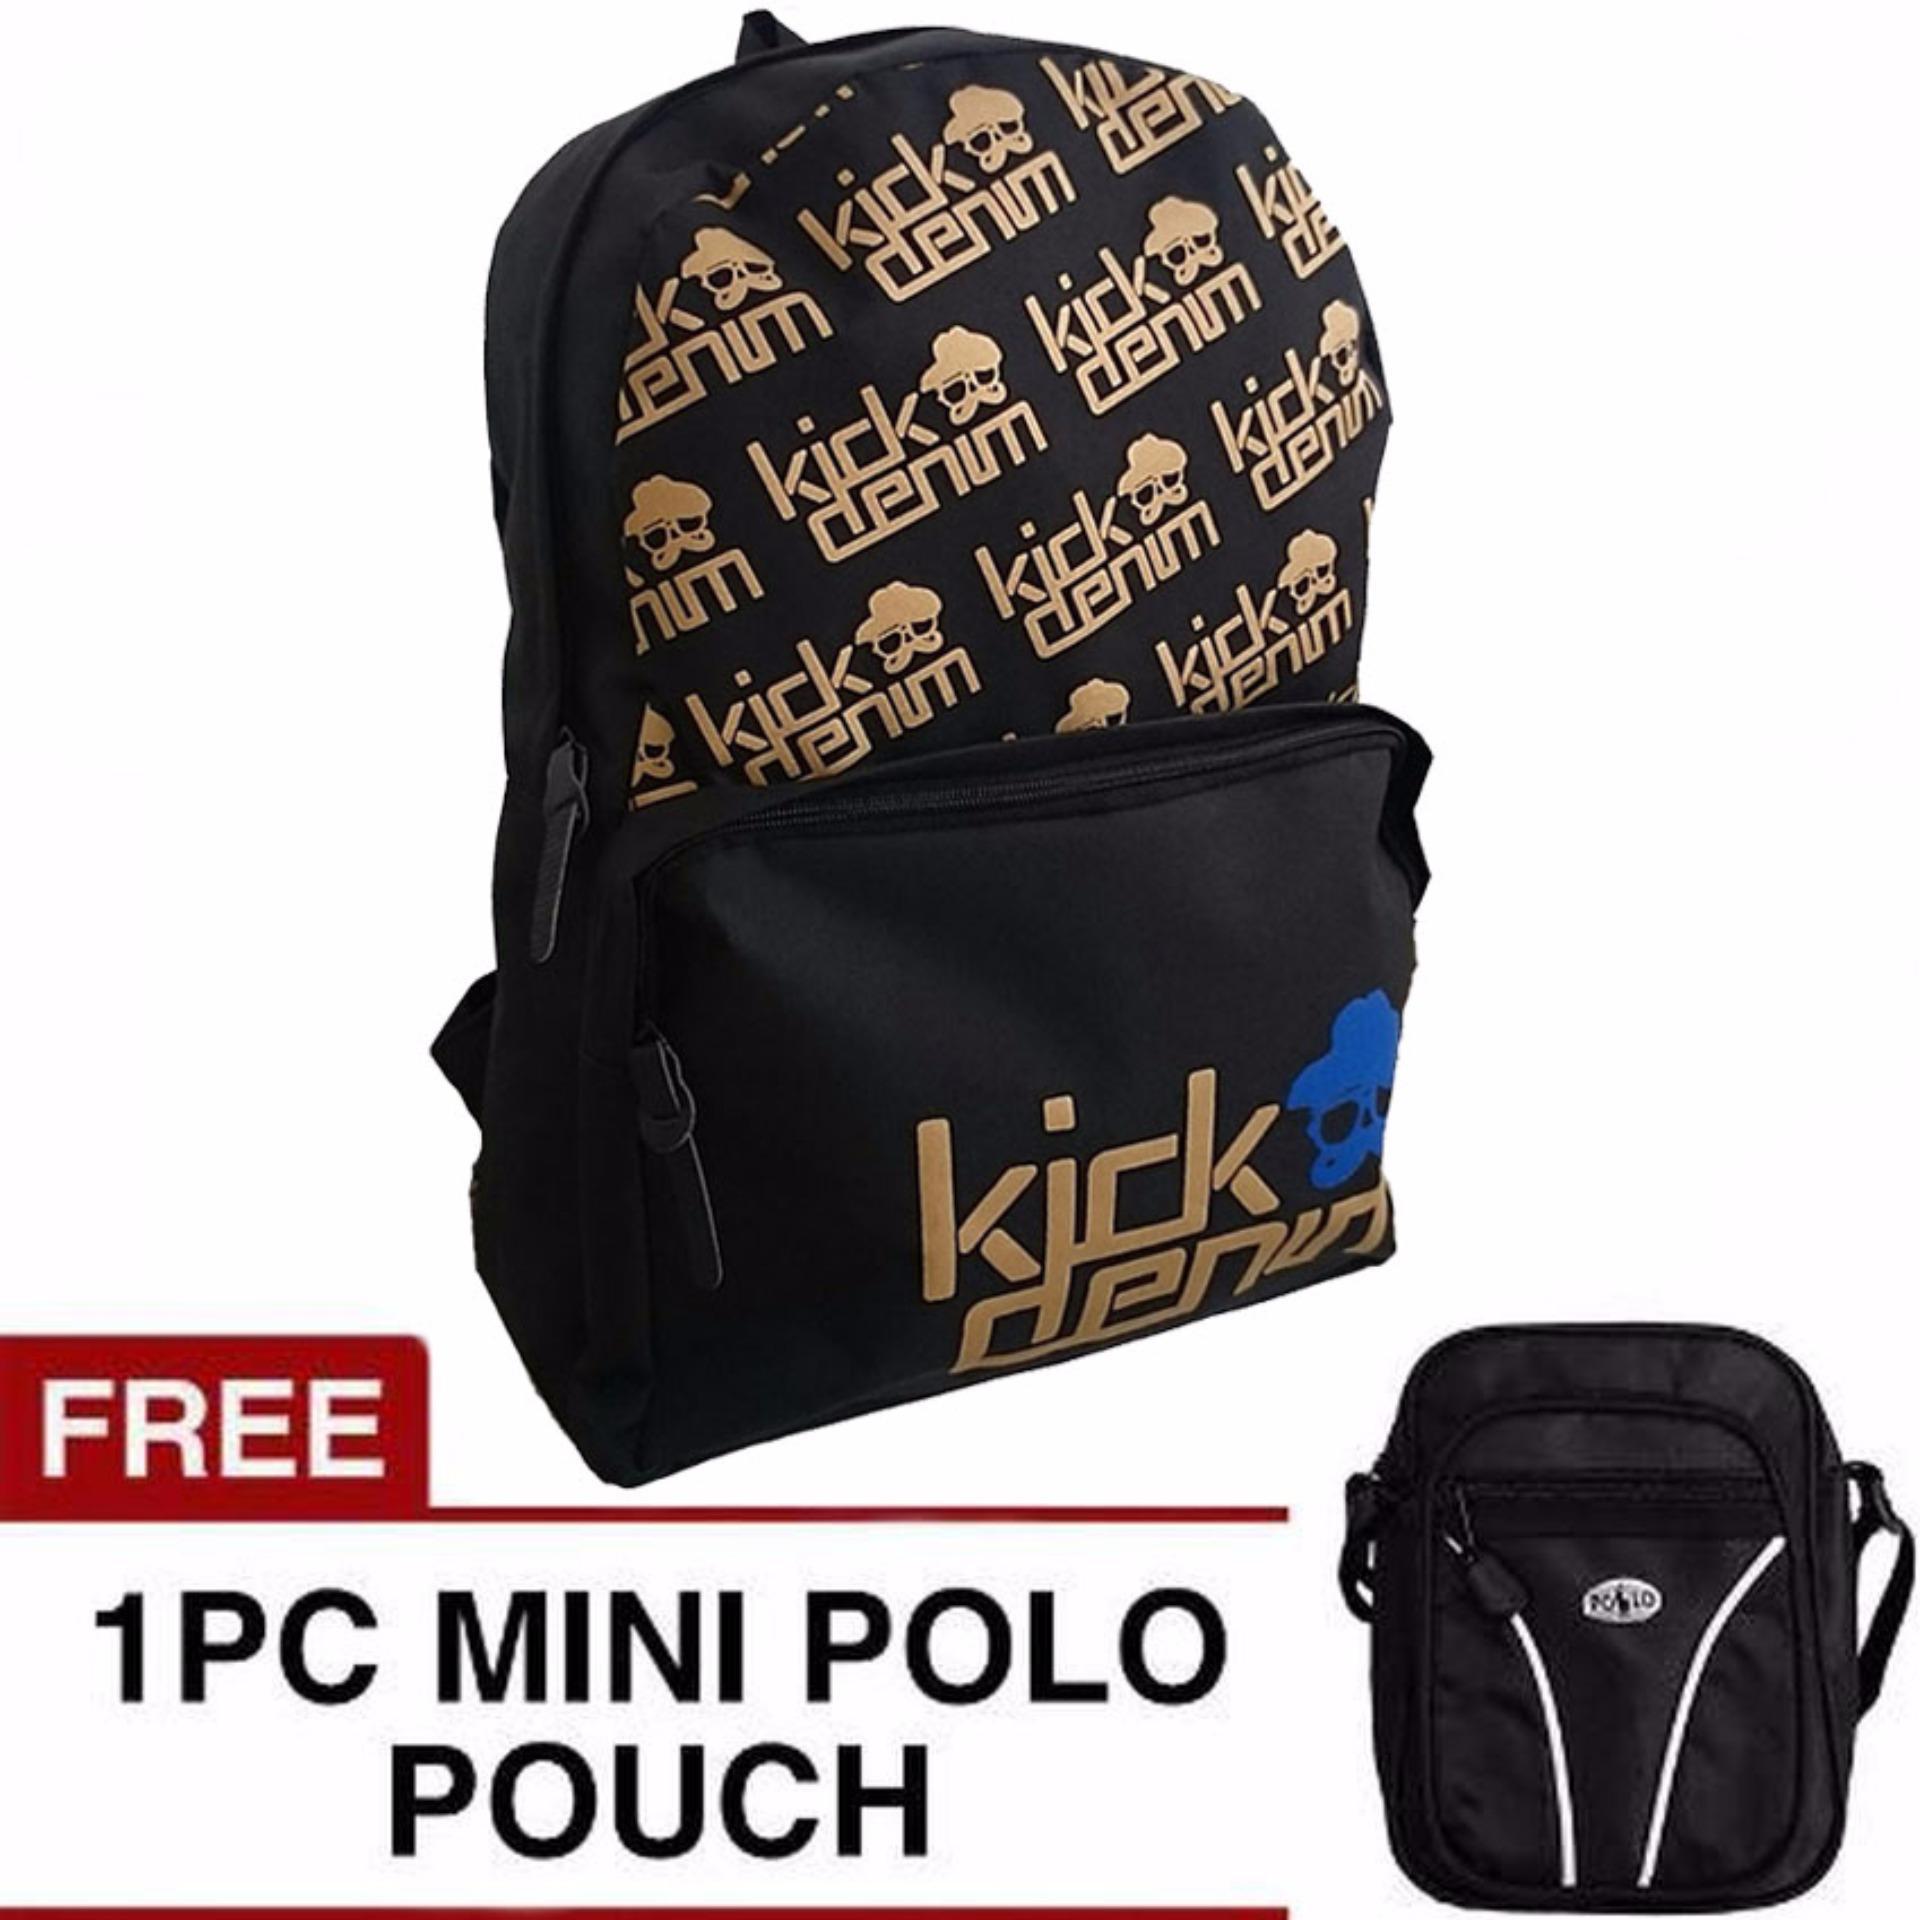 Bougger Emboss Laptop Backpack Free Mini Poloclub Pouch Selempang Source · Bag & Stuff Bougger Emboss